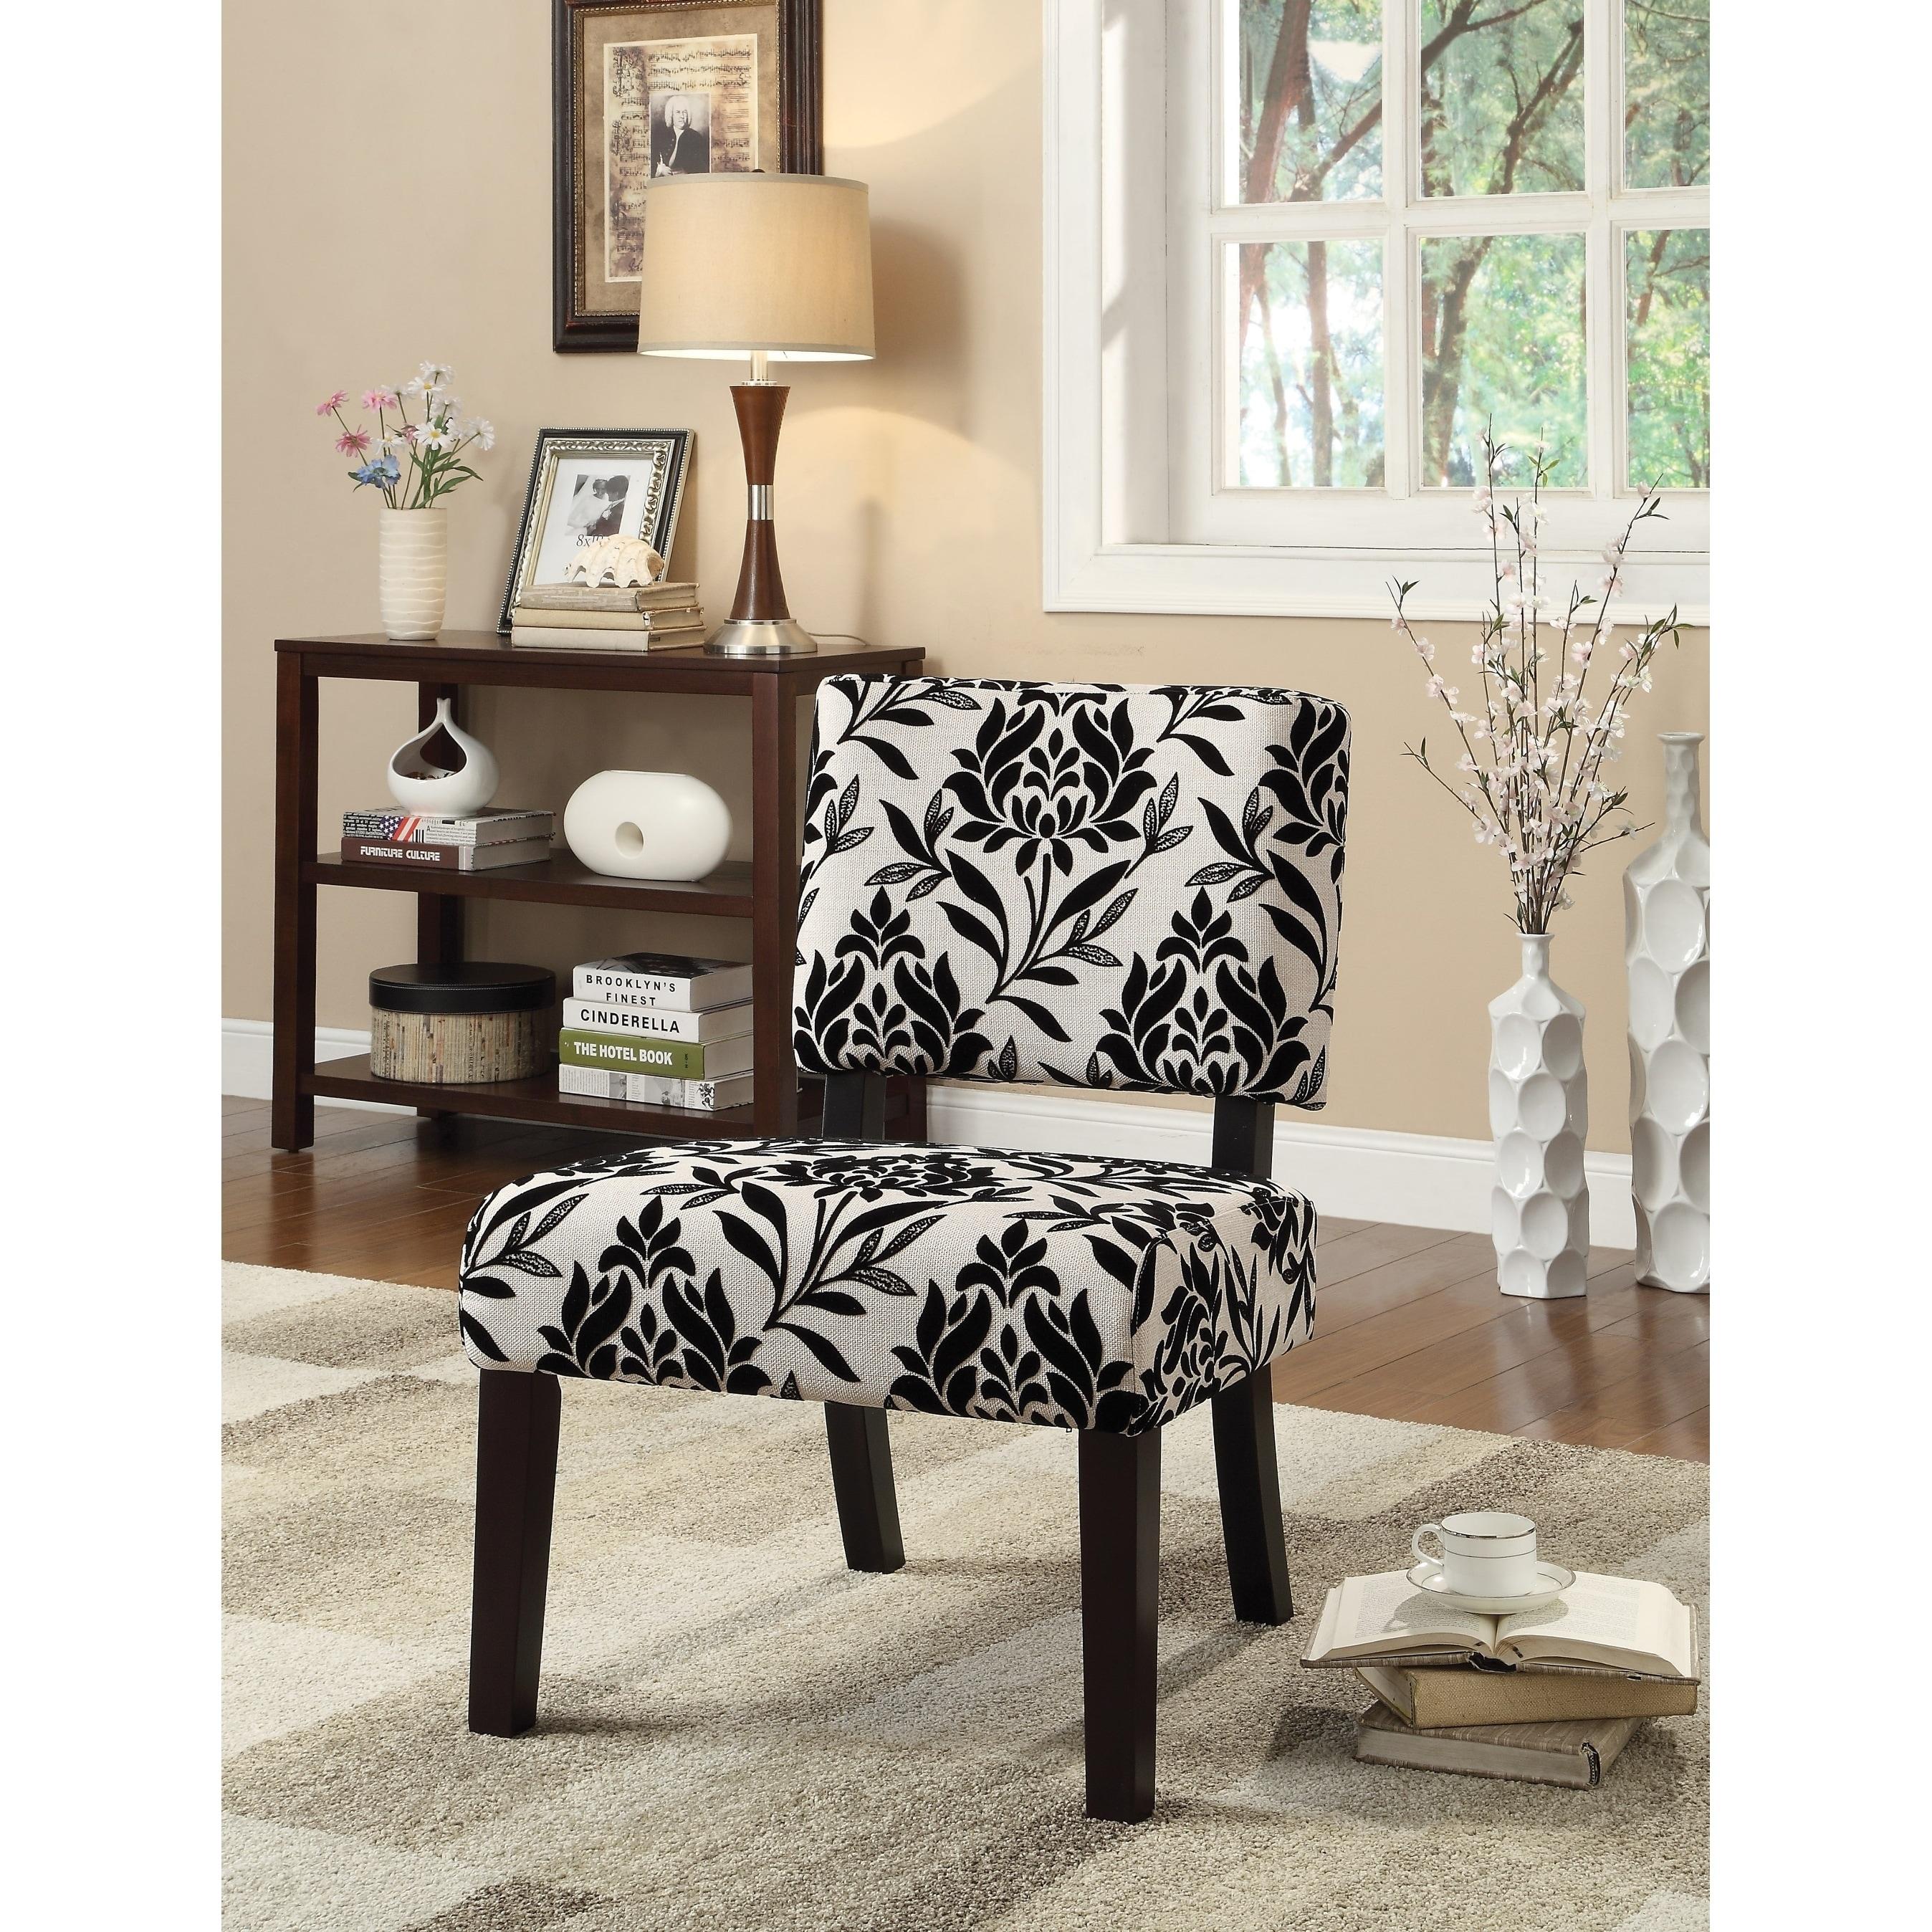 Strange Office Star Jasmine Accent Chair In Paradise Evergreenethics Interior Chair Design Evergreenethicsorg